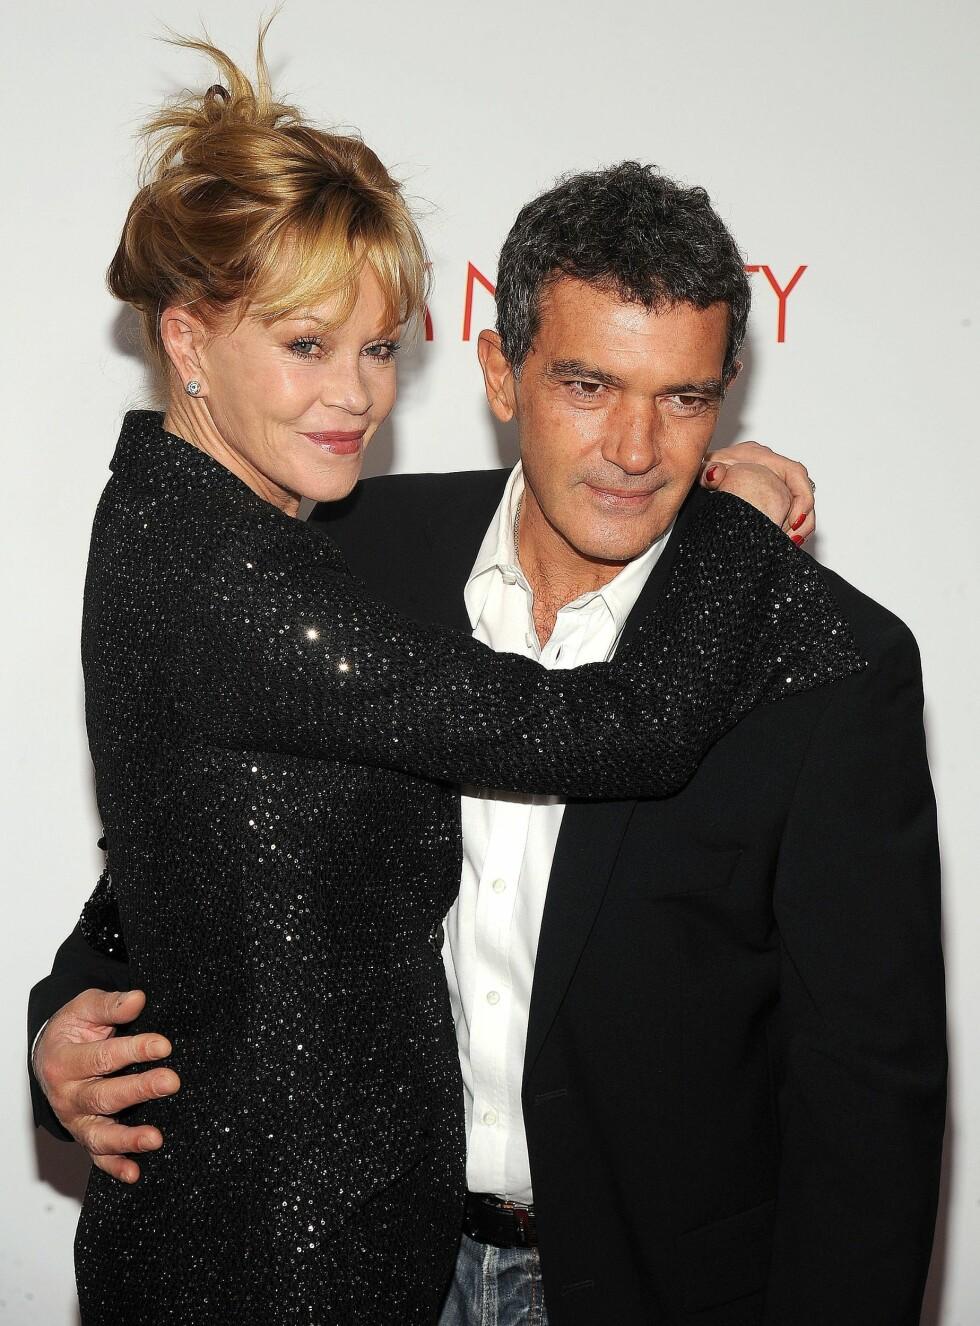 <strong>SKILLES:</strong> Melanie Griffith og Antonio Banderas skilles etter 18 år som ektepar. Foto: REX/Picture Perfect/All Over Press